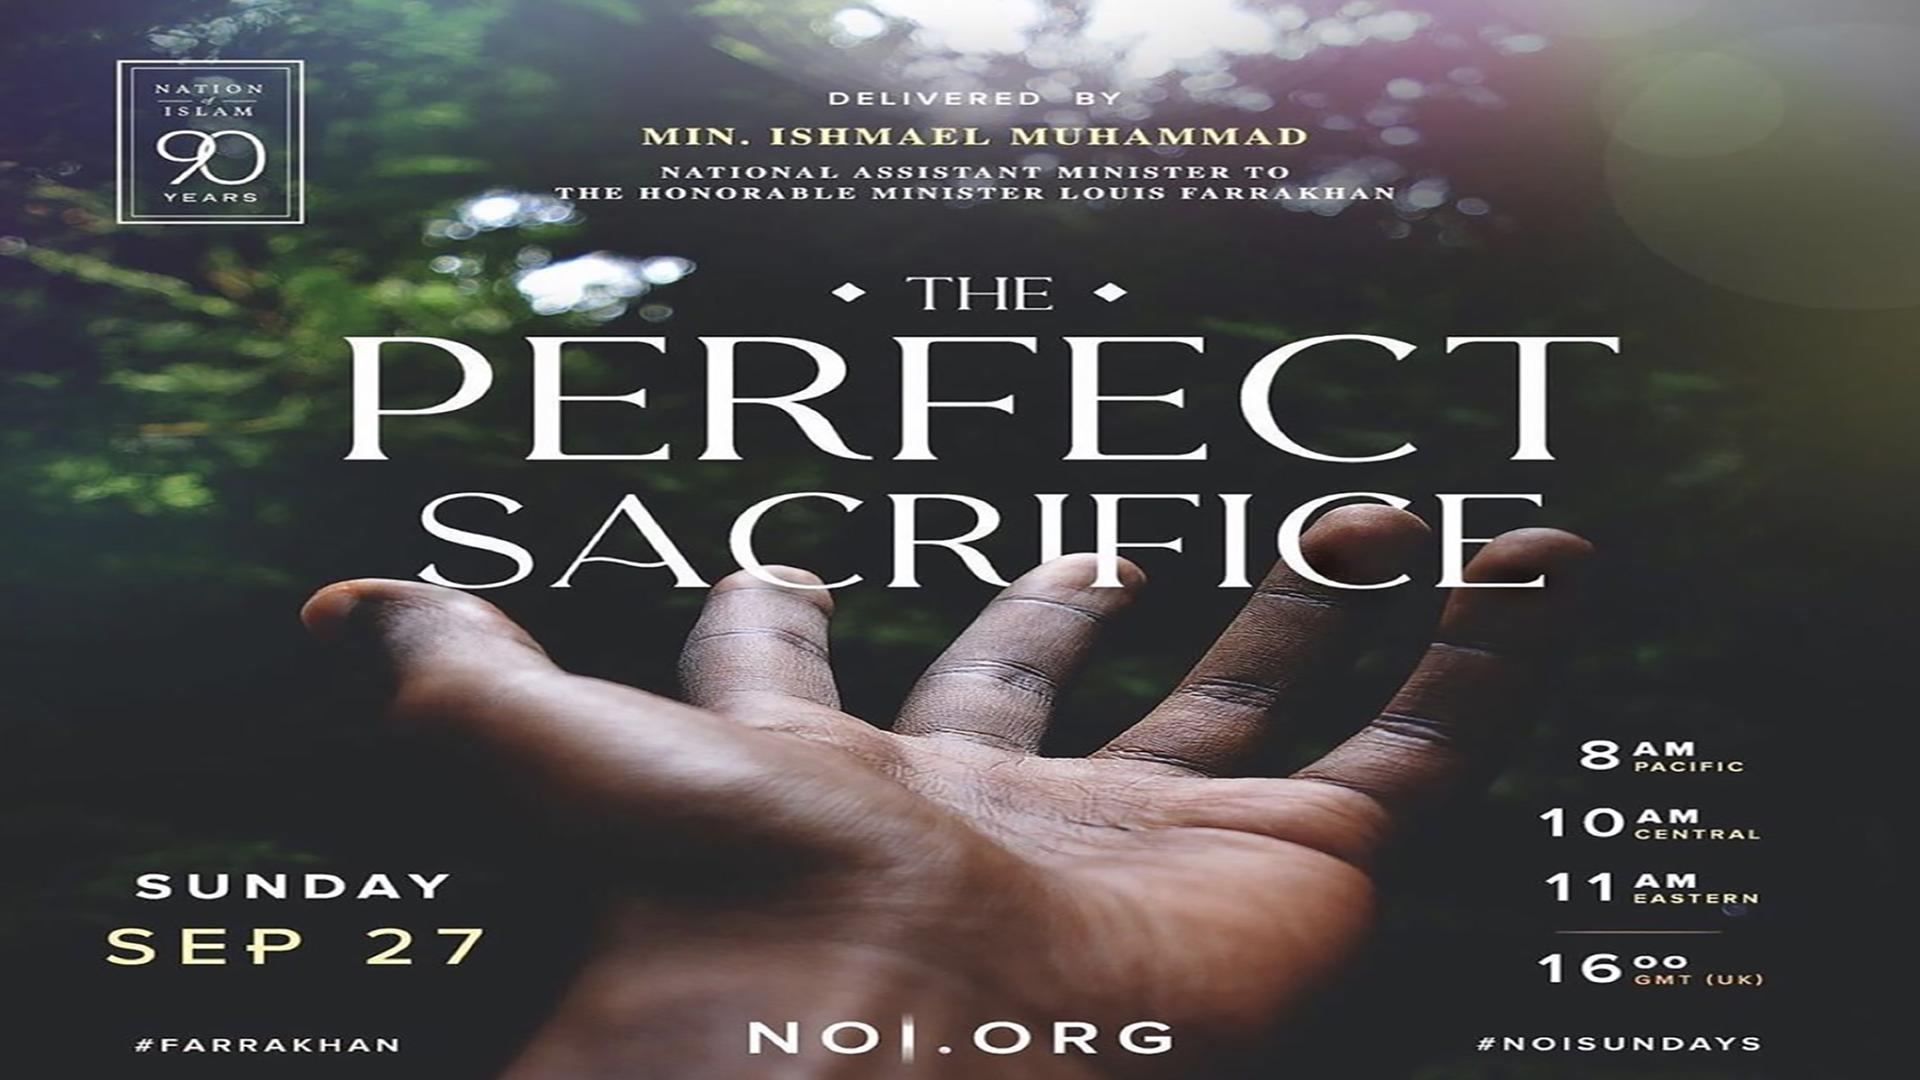 The Perfect Sacrifice